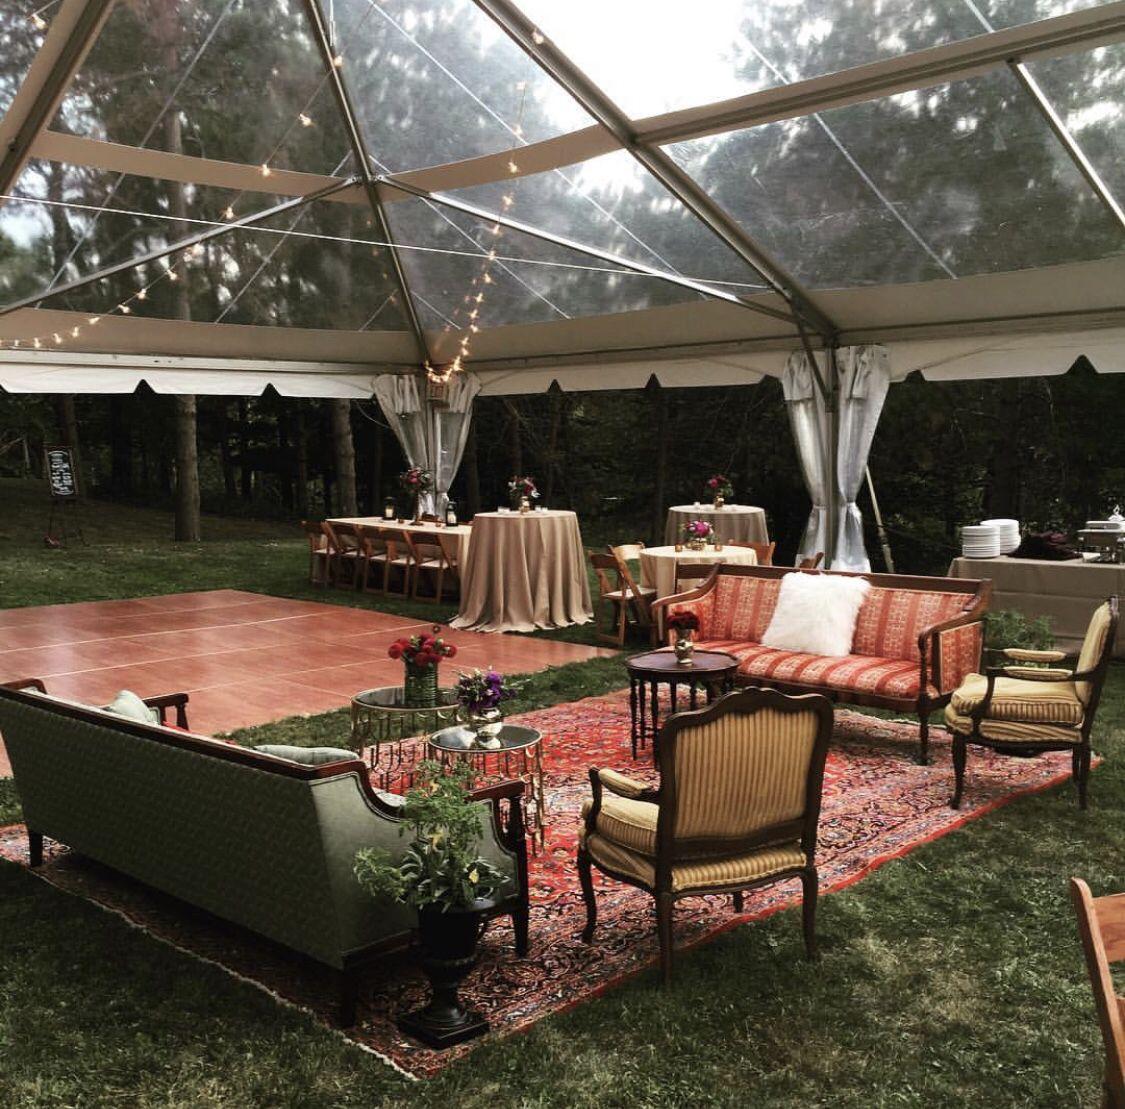 Backyard party | Event rental, Tent rentals, Wedding rentals